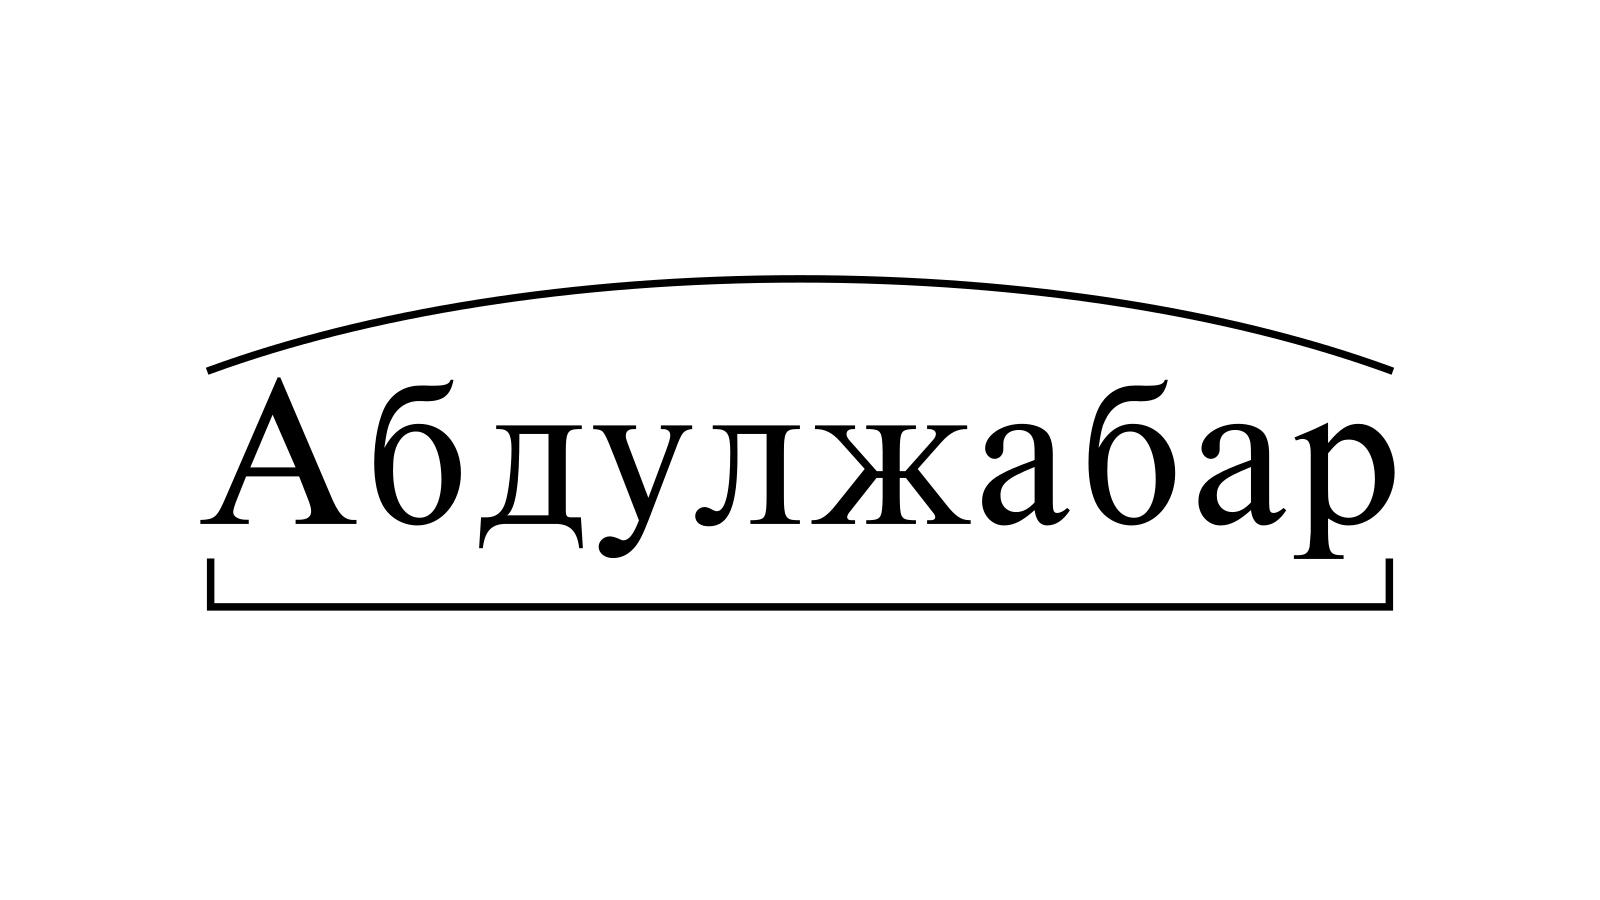 Разбор слова «Абдулжабар» по составу